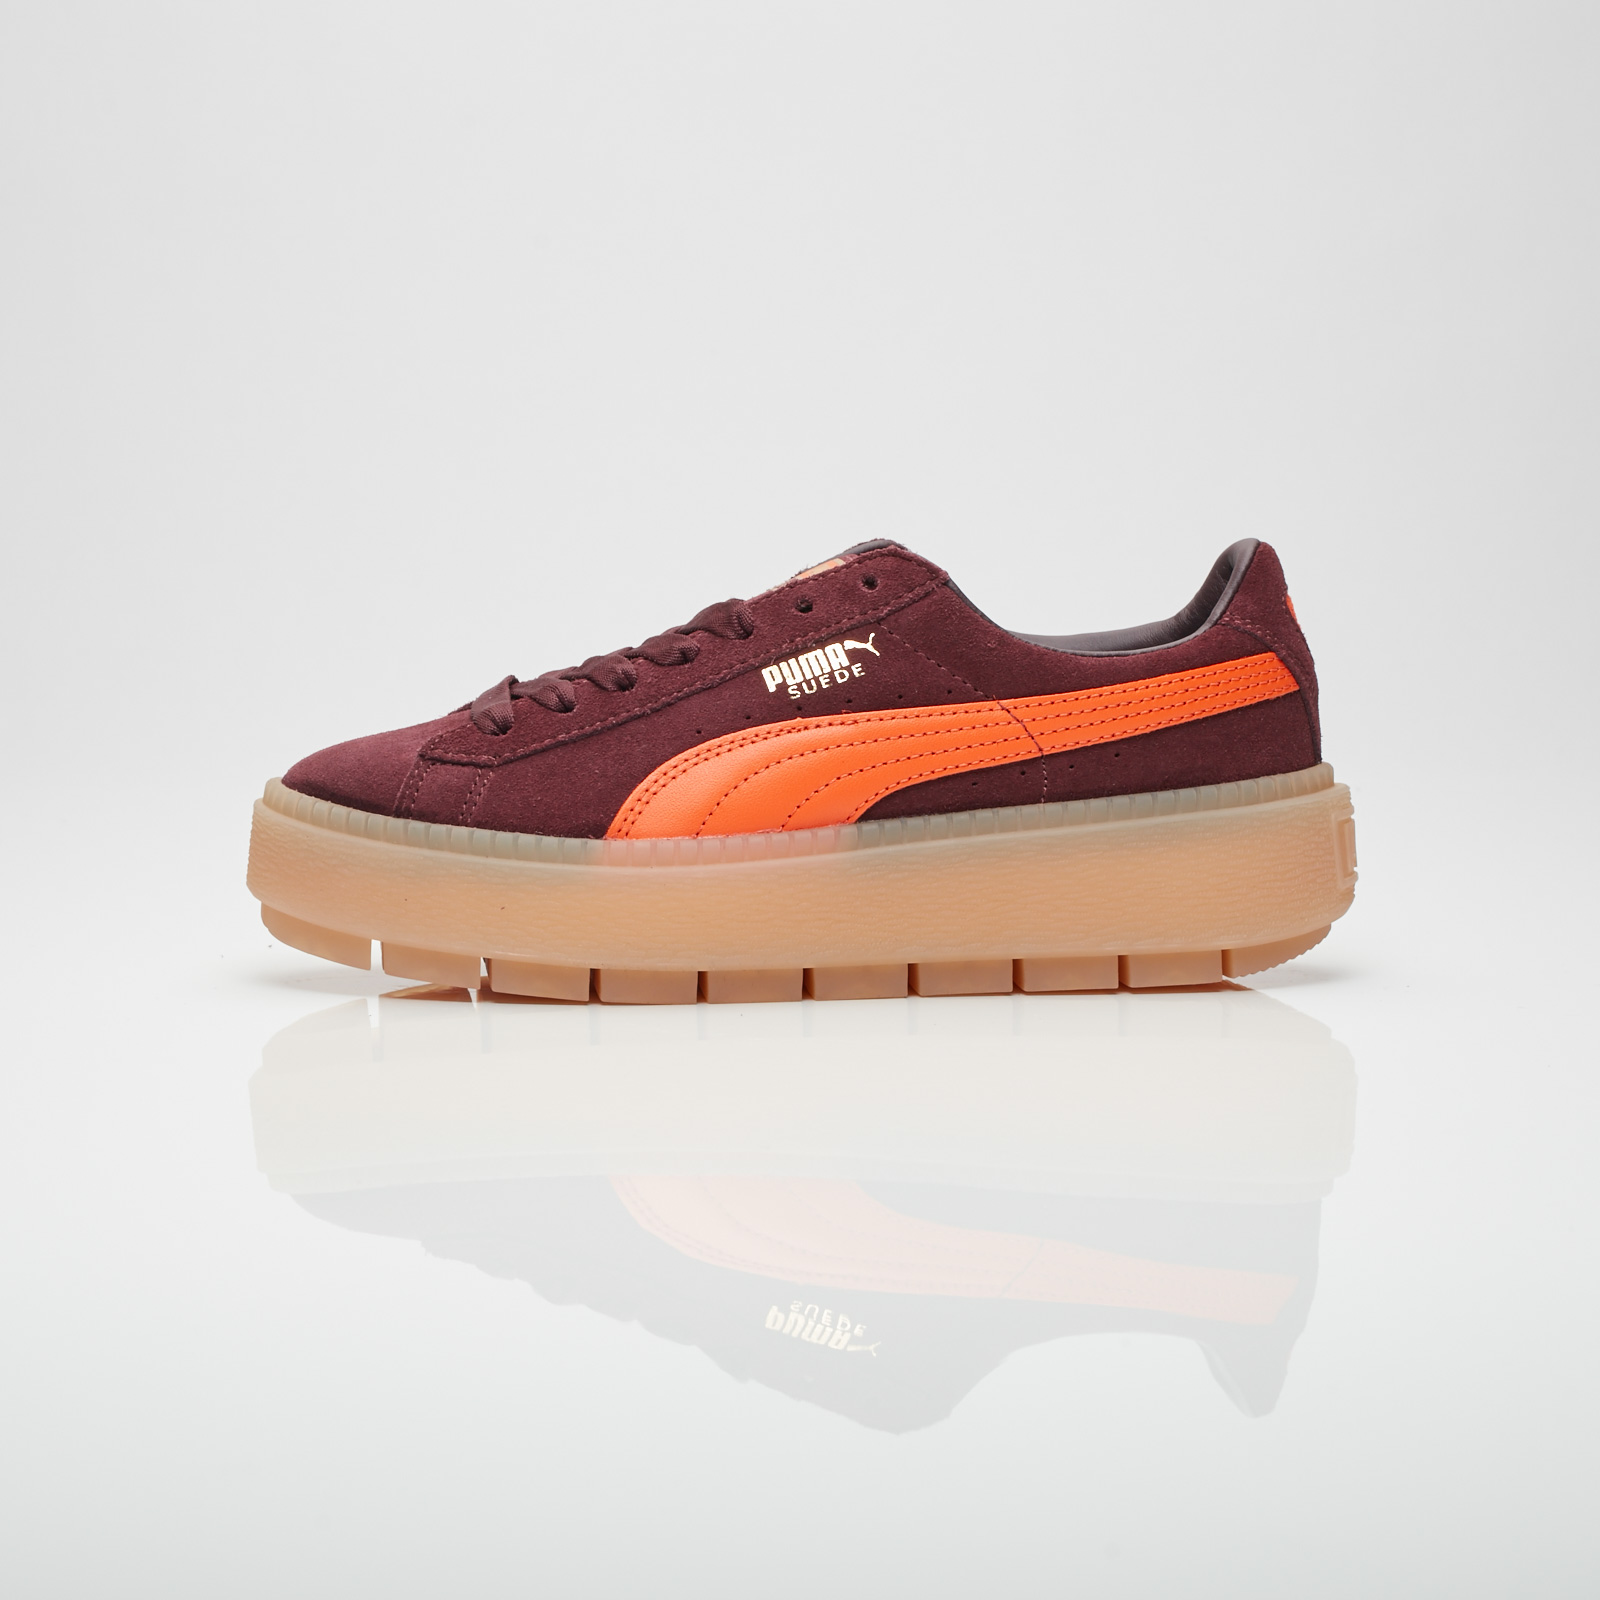 Puma Suede Platform Trace Block 367057 01 Sneakersnstuff